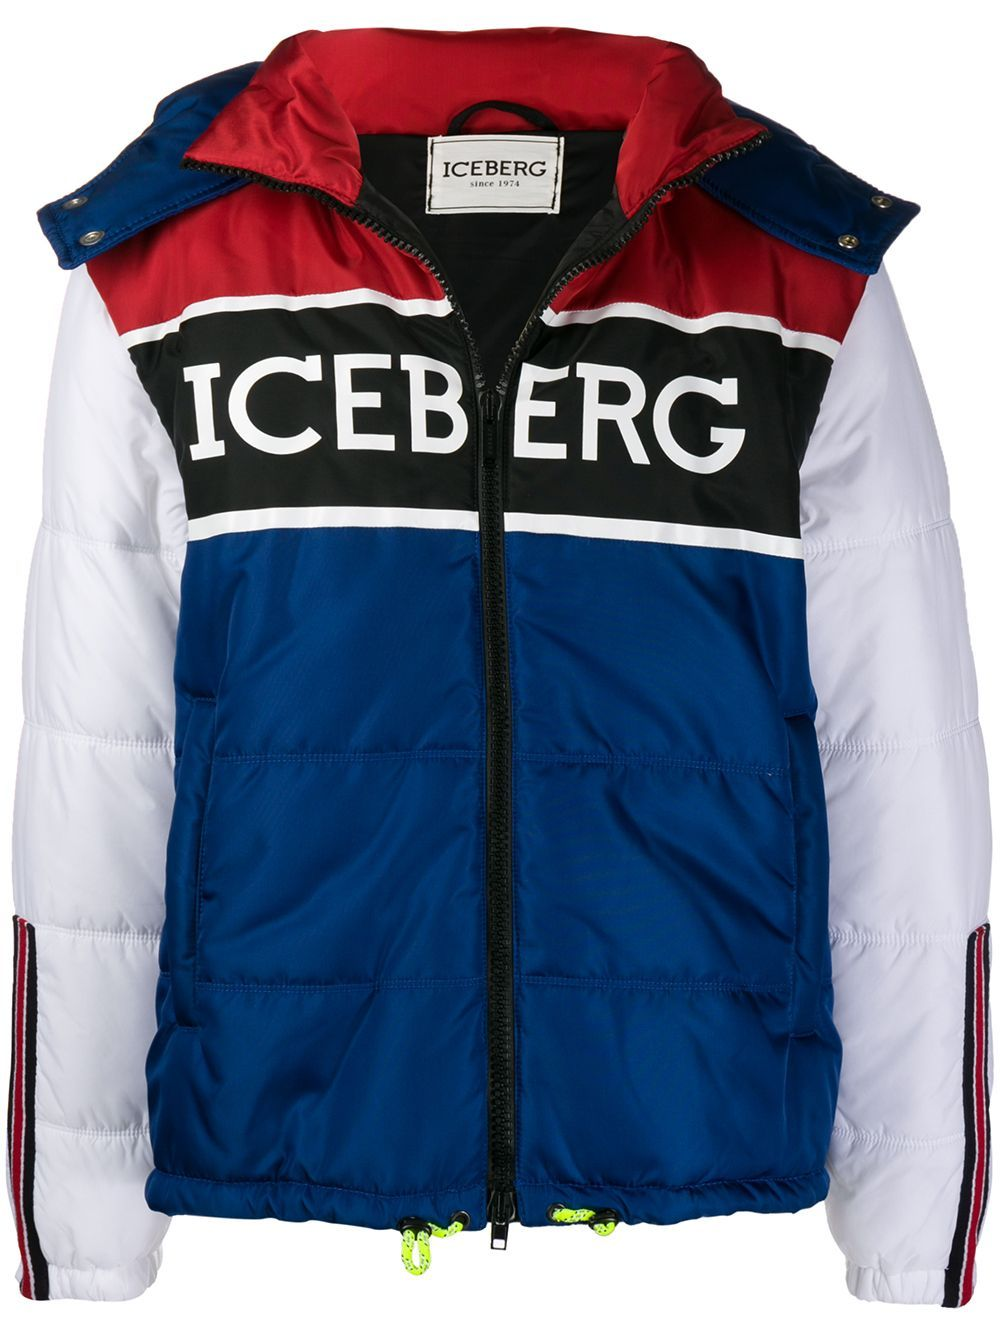 Iceberg Padded Hooded Jacket Farfetch Hooded Jacket Jackets Hooded Jacket Blue [ 1334 x 1000 Pixel ]